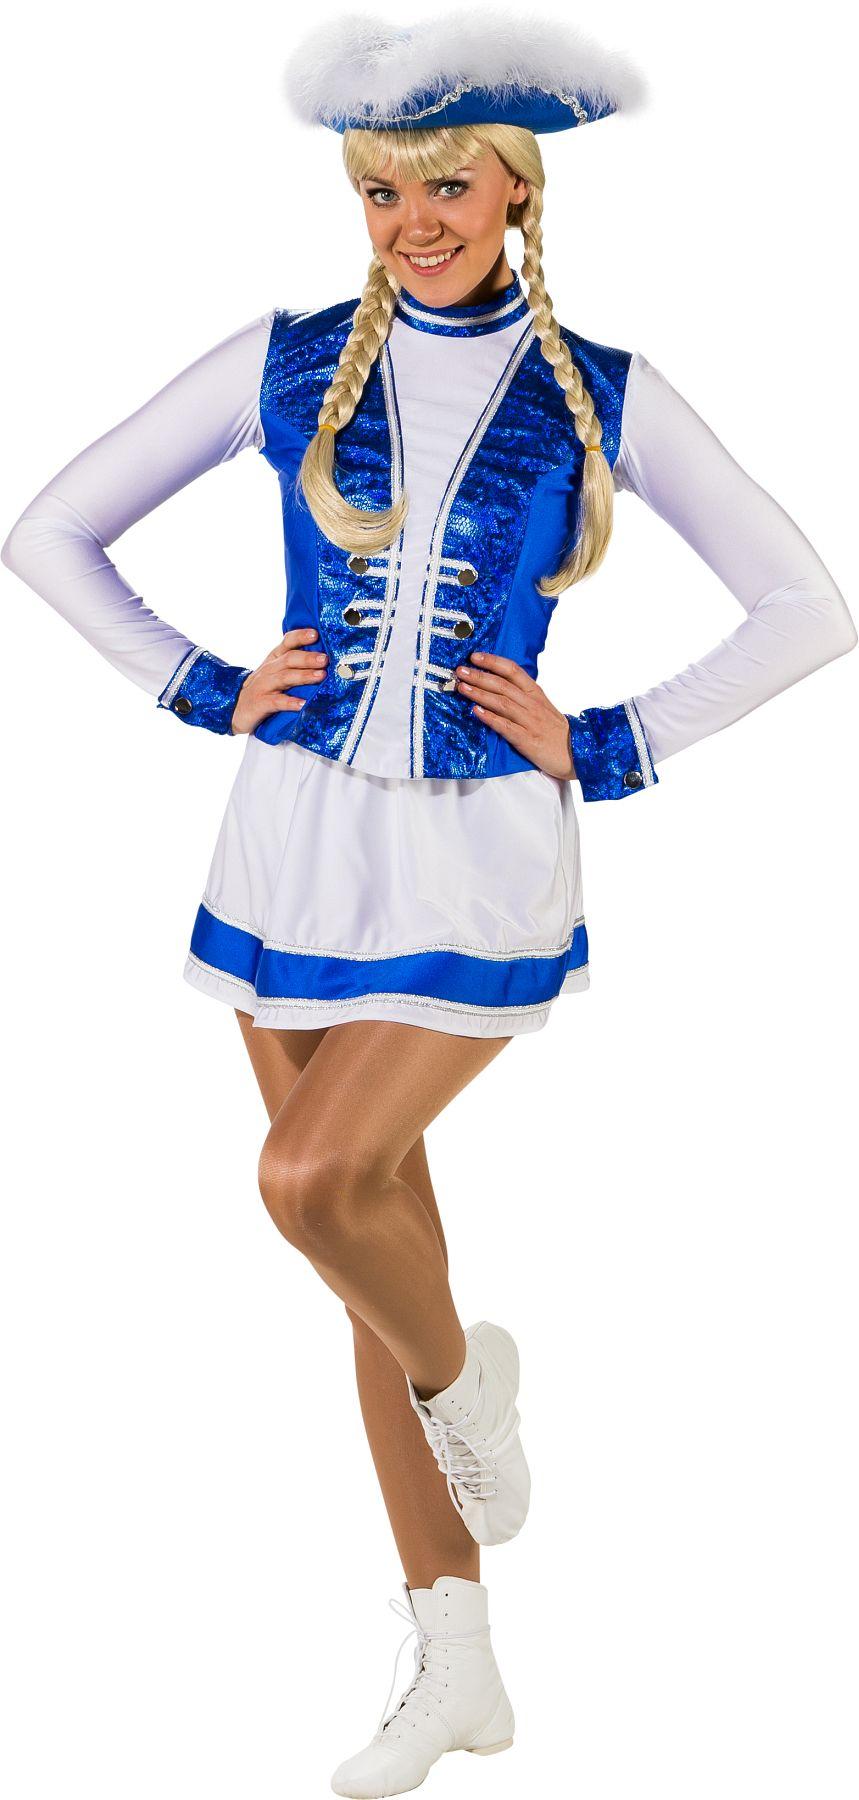 Gardekleid 2-teilig, blau-weiß